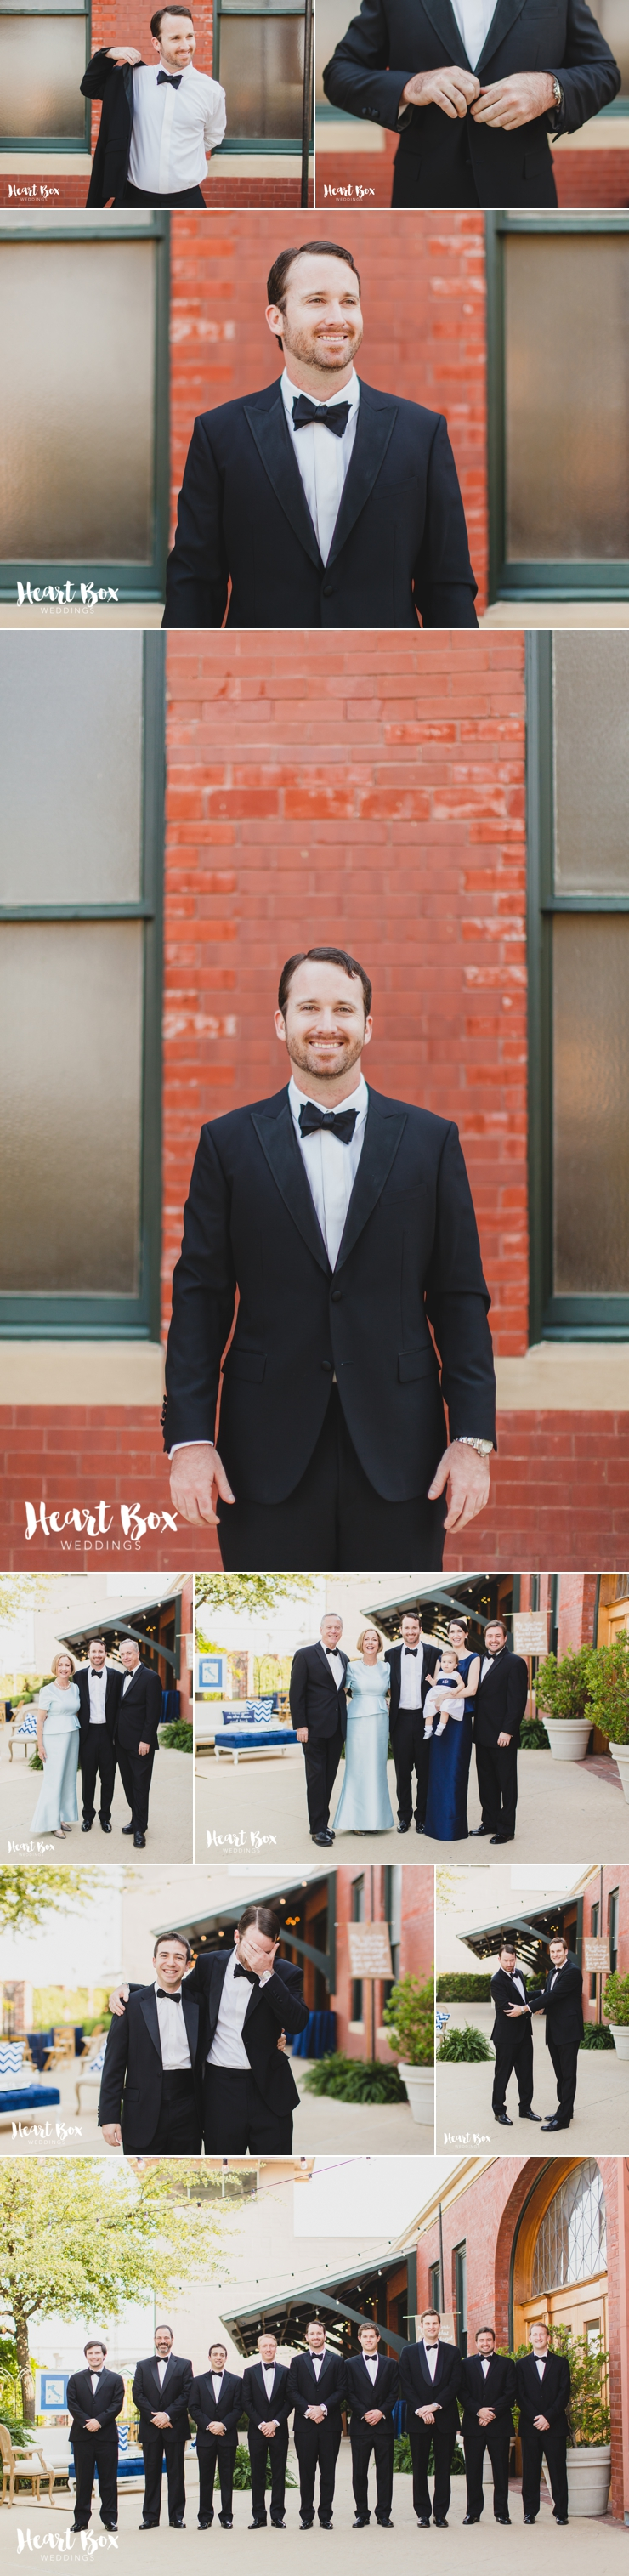 Anthony Wedding Blog Collages 9.jpg